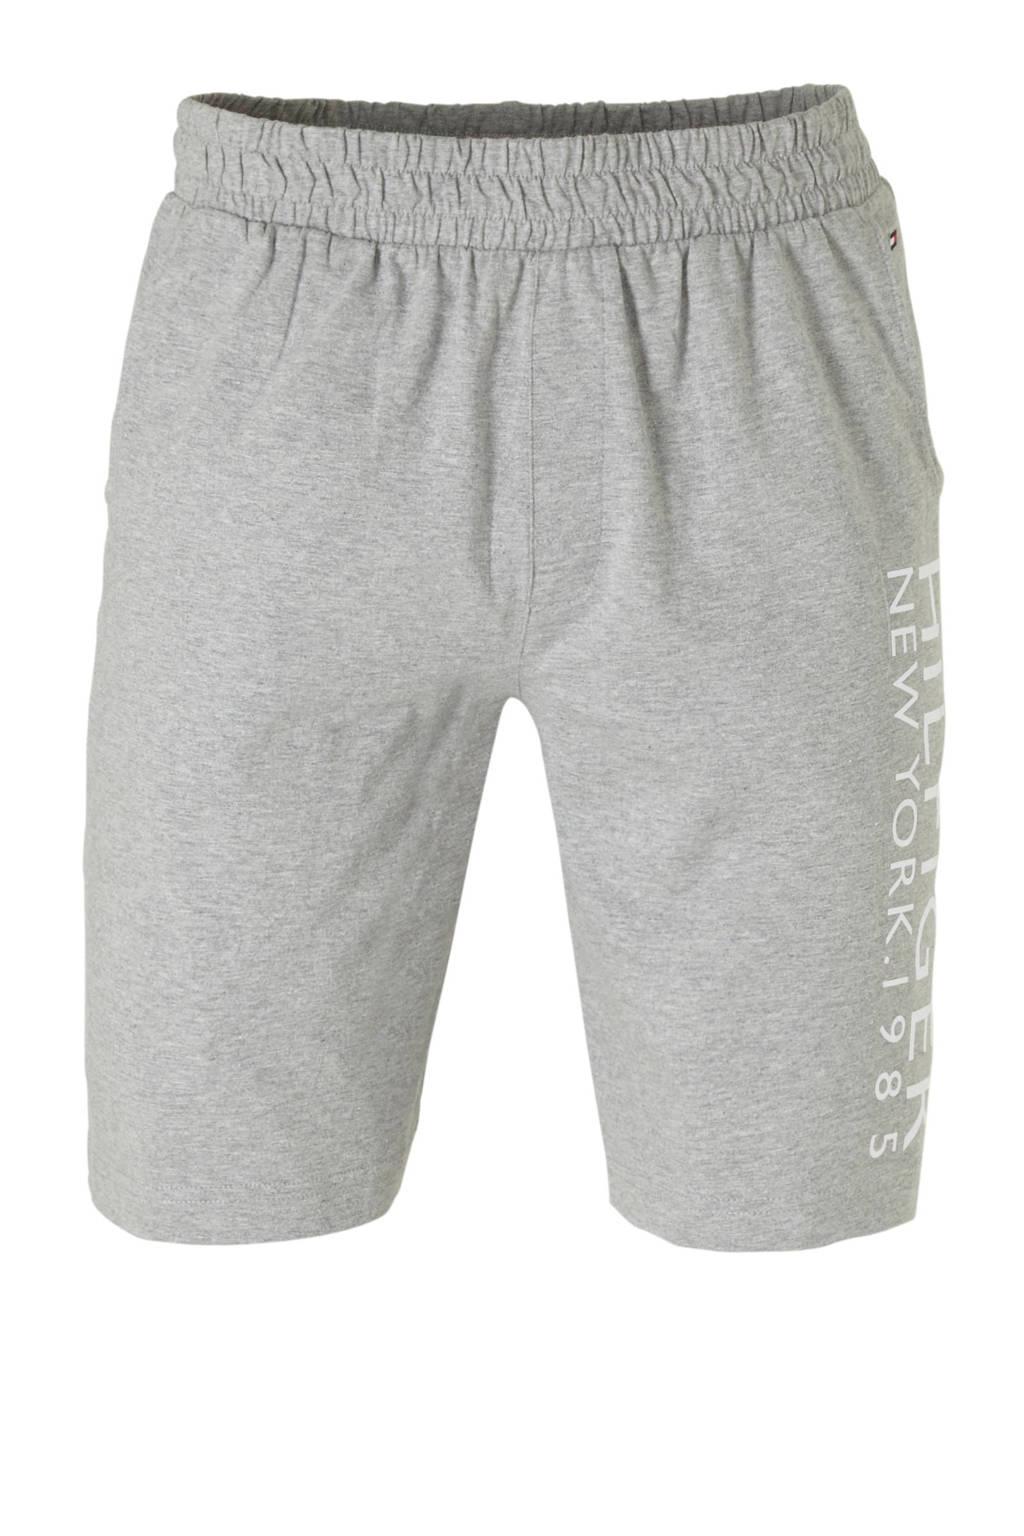 Tommy Hilfiger pyjamashort met printopdruk grijs mêlee, grijs mêlee